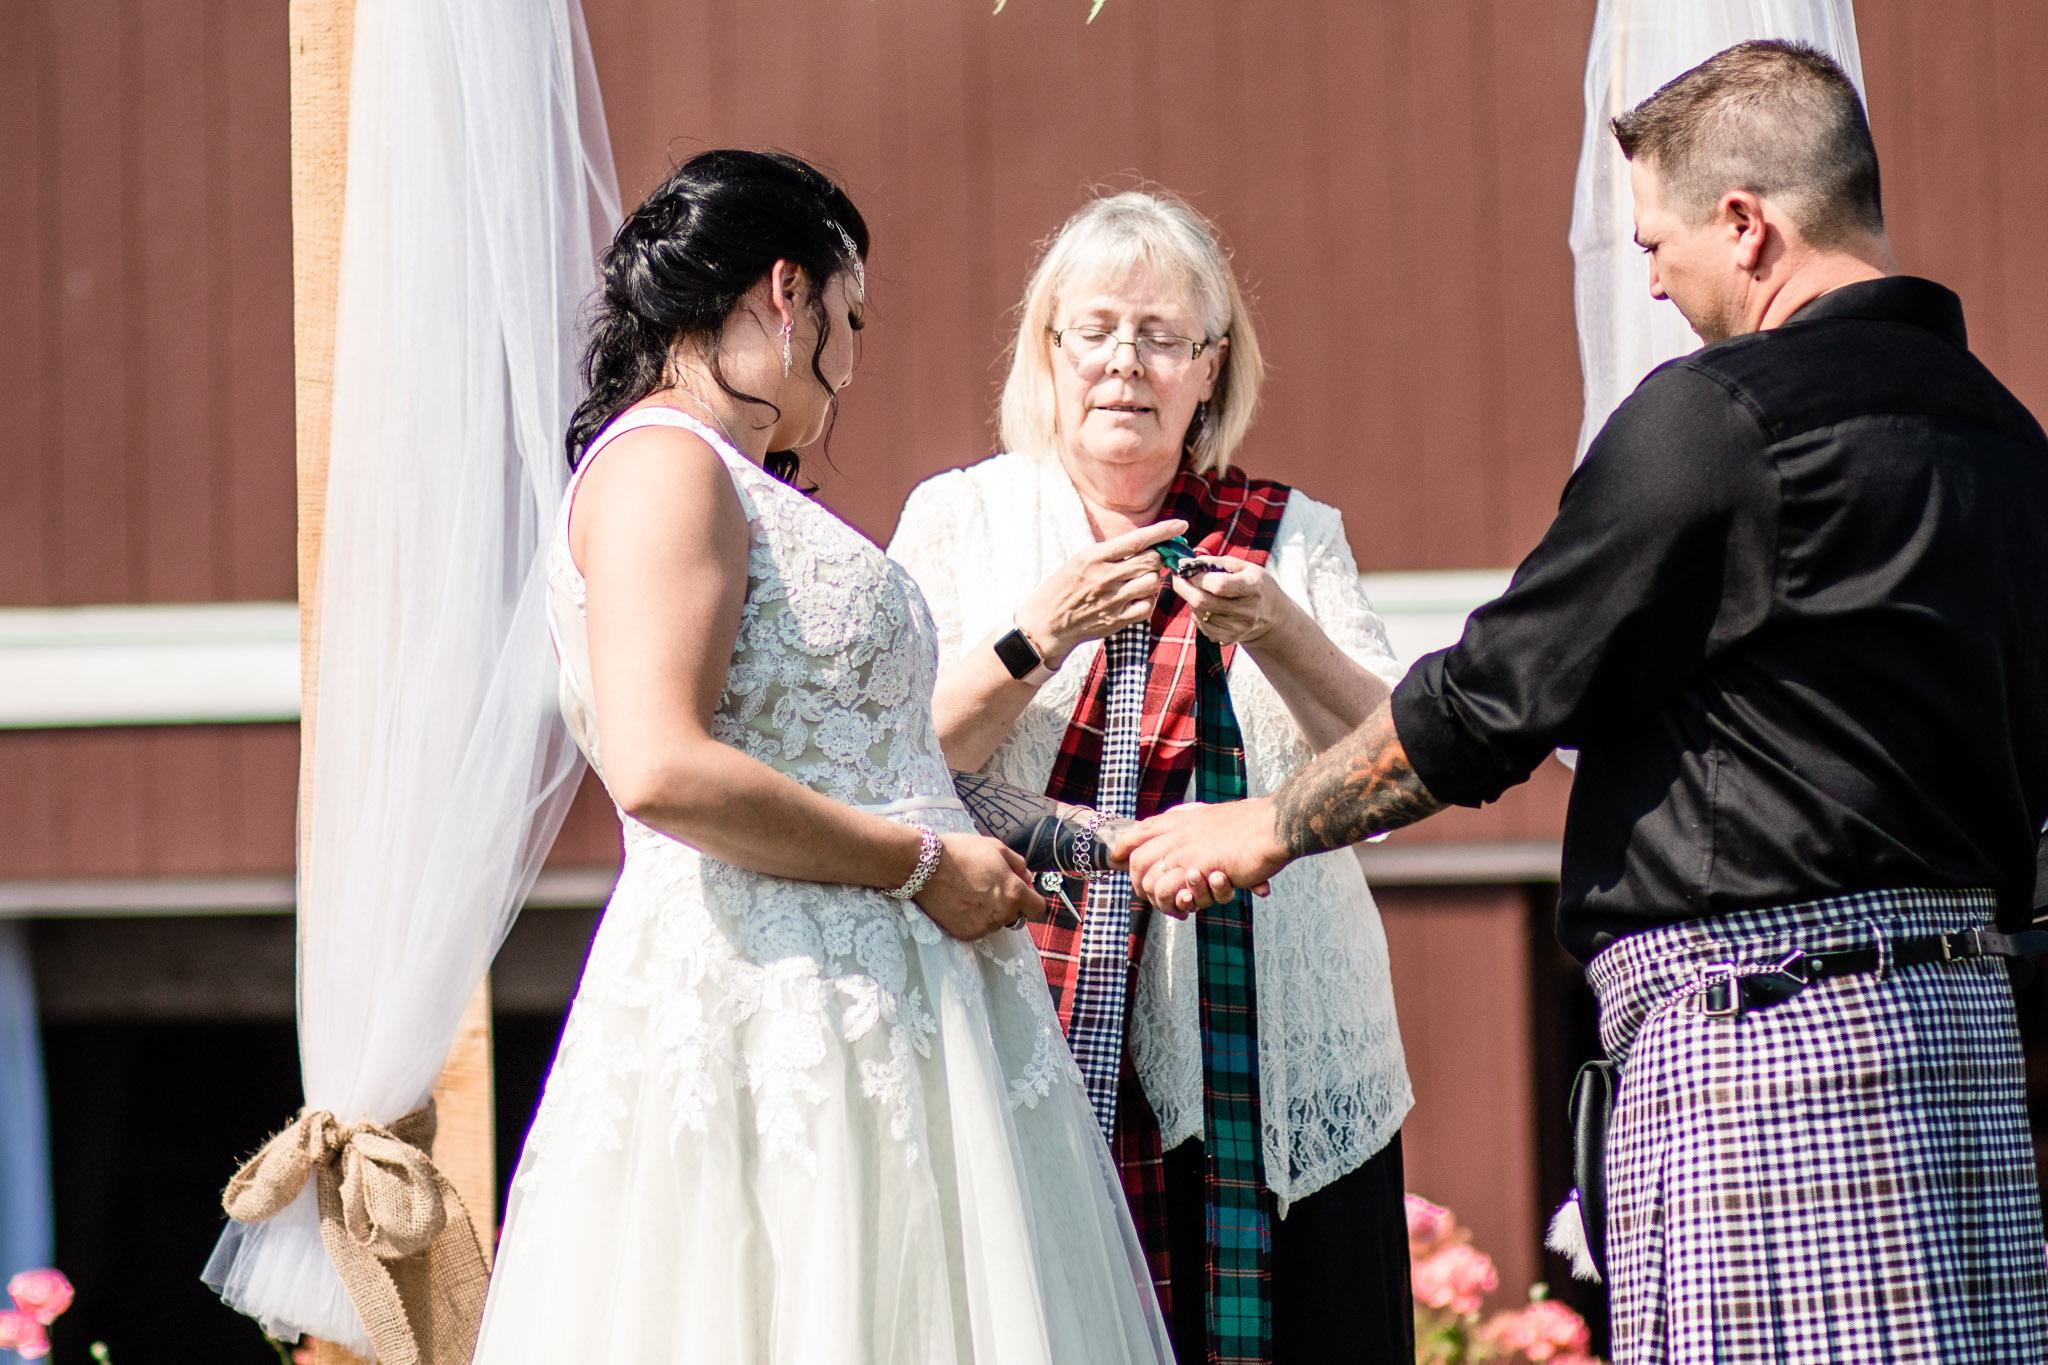 White-Owl-Barn-Langley-Wedding-Photographer-Rustic-Scottish-Country-Food-Truck-Documentary-Open-Bar-Wedding-269.jpg